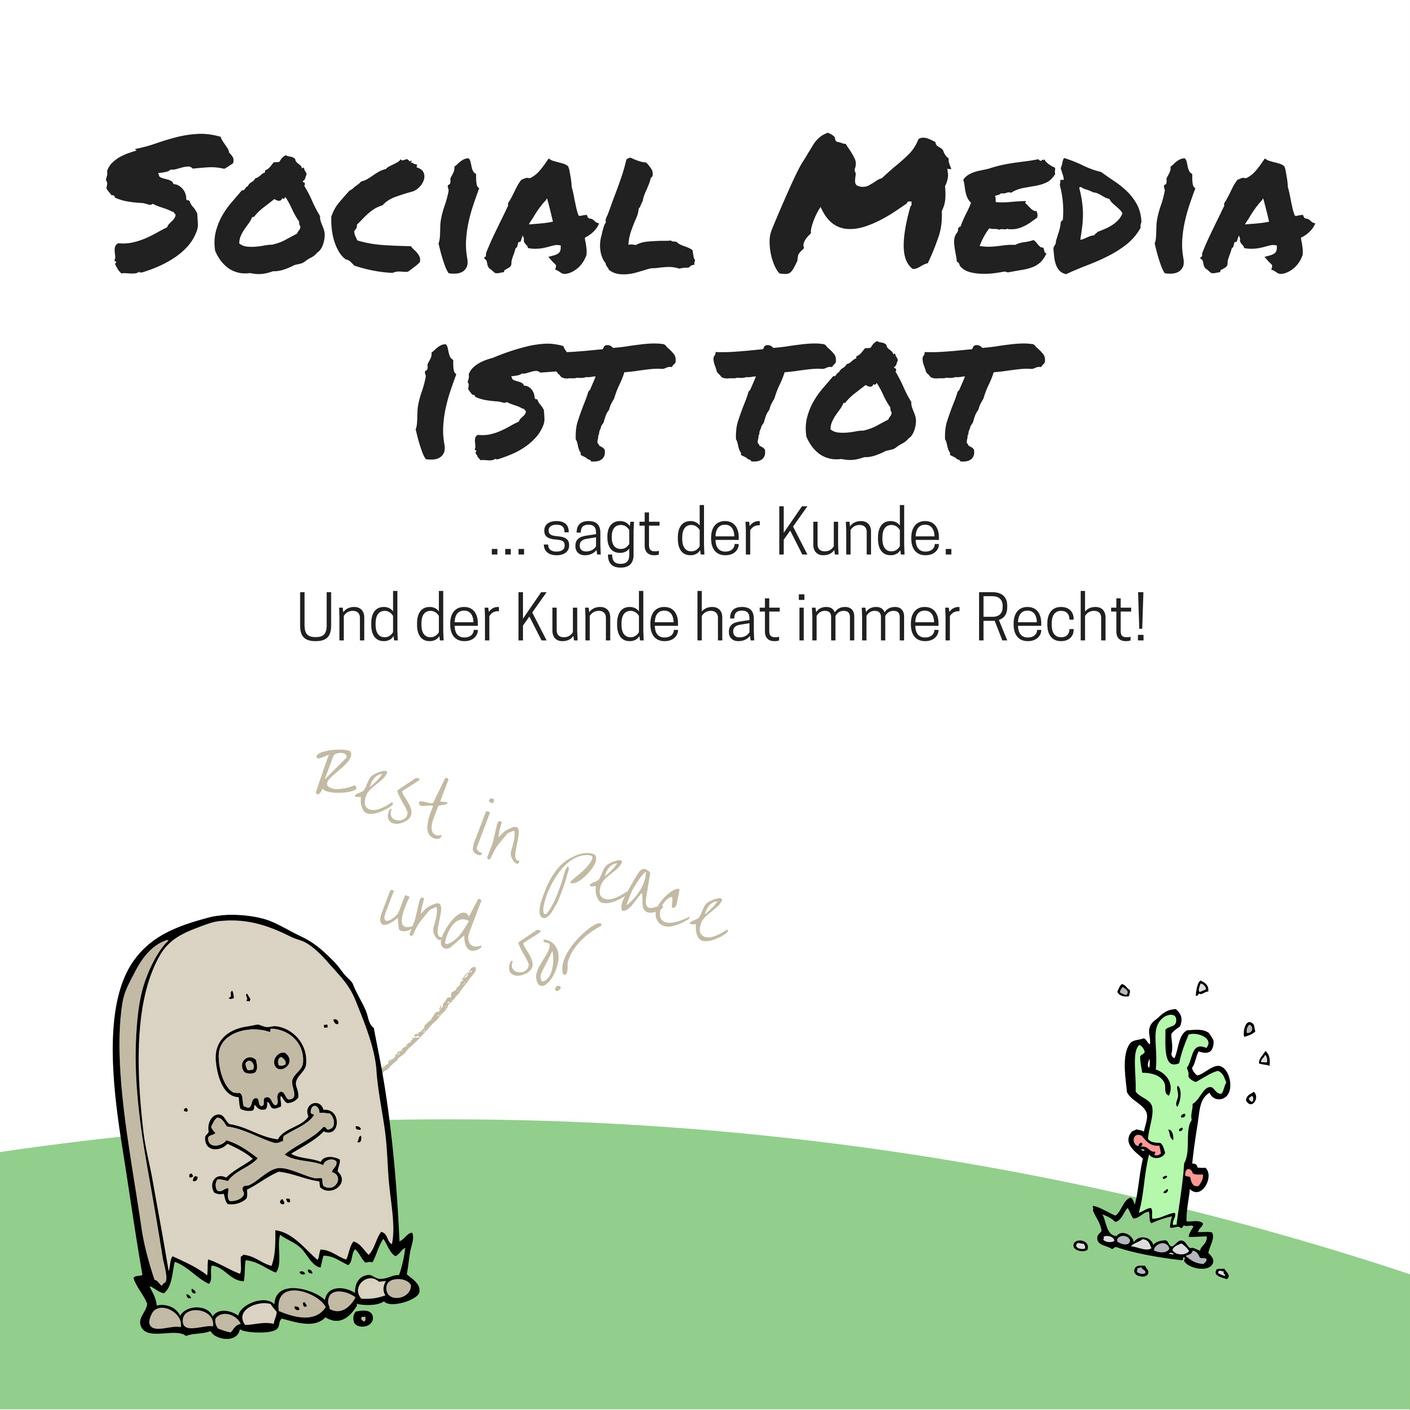 Social Media ist tot - Cover Vorschaubild